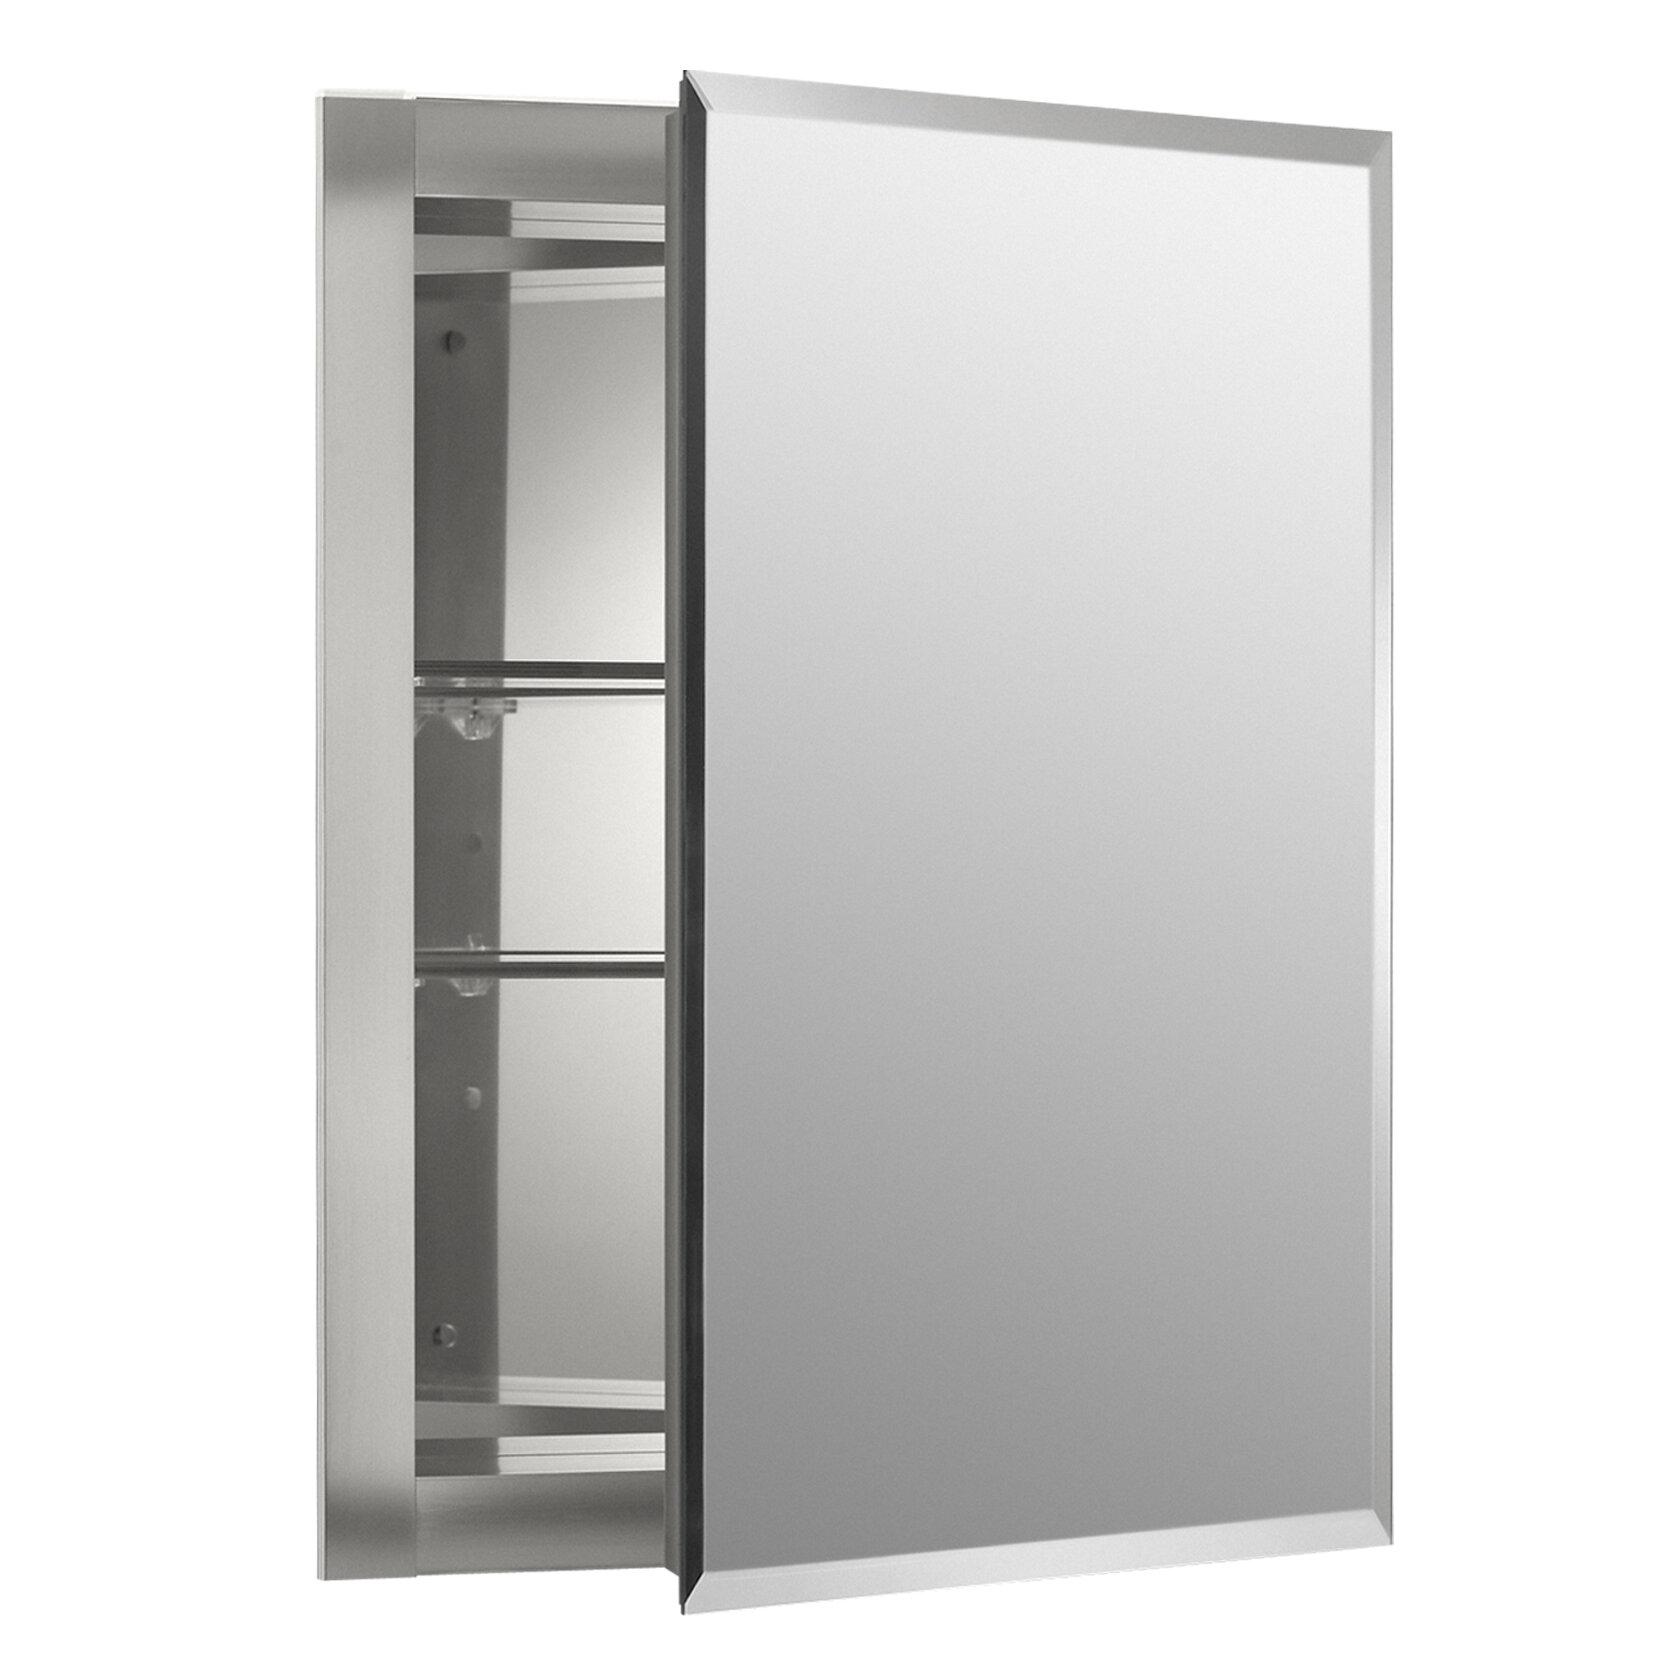 K Cb Clr1620fs Kohler 16 X 20 Recessed Frameless Medicine Cabinet With 2 Adjule Shelves Reviews Wayfair